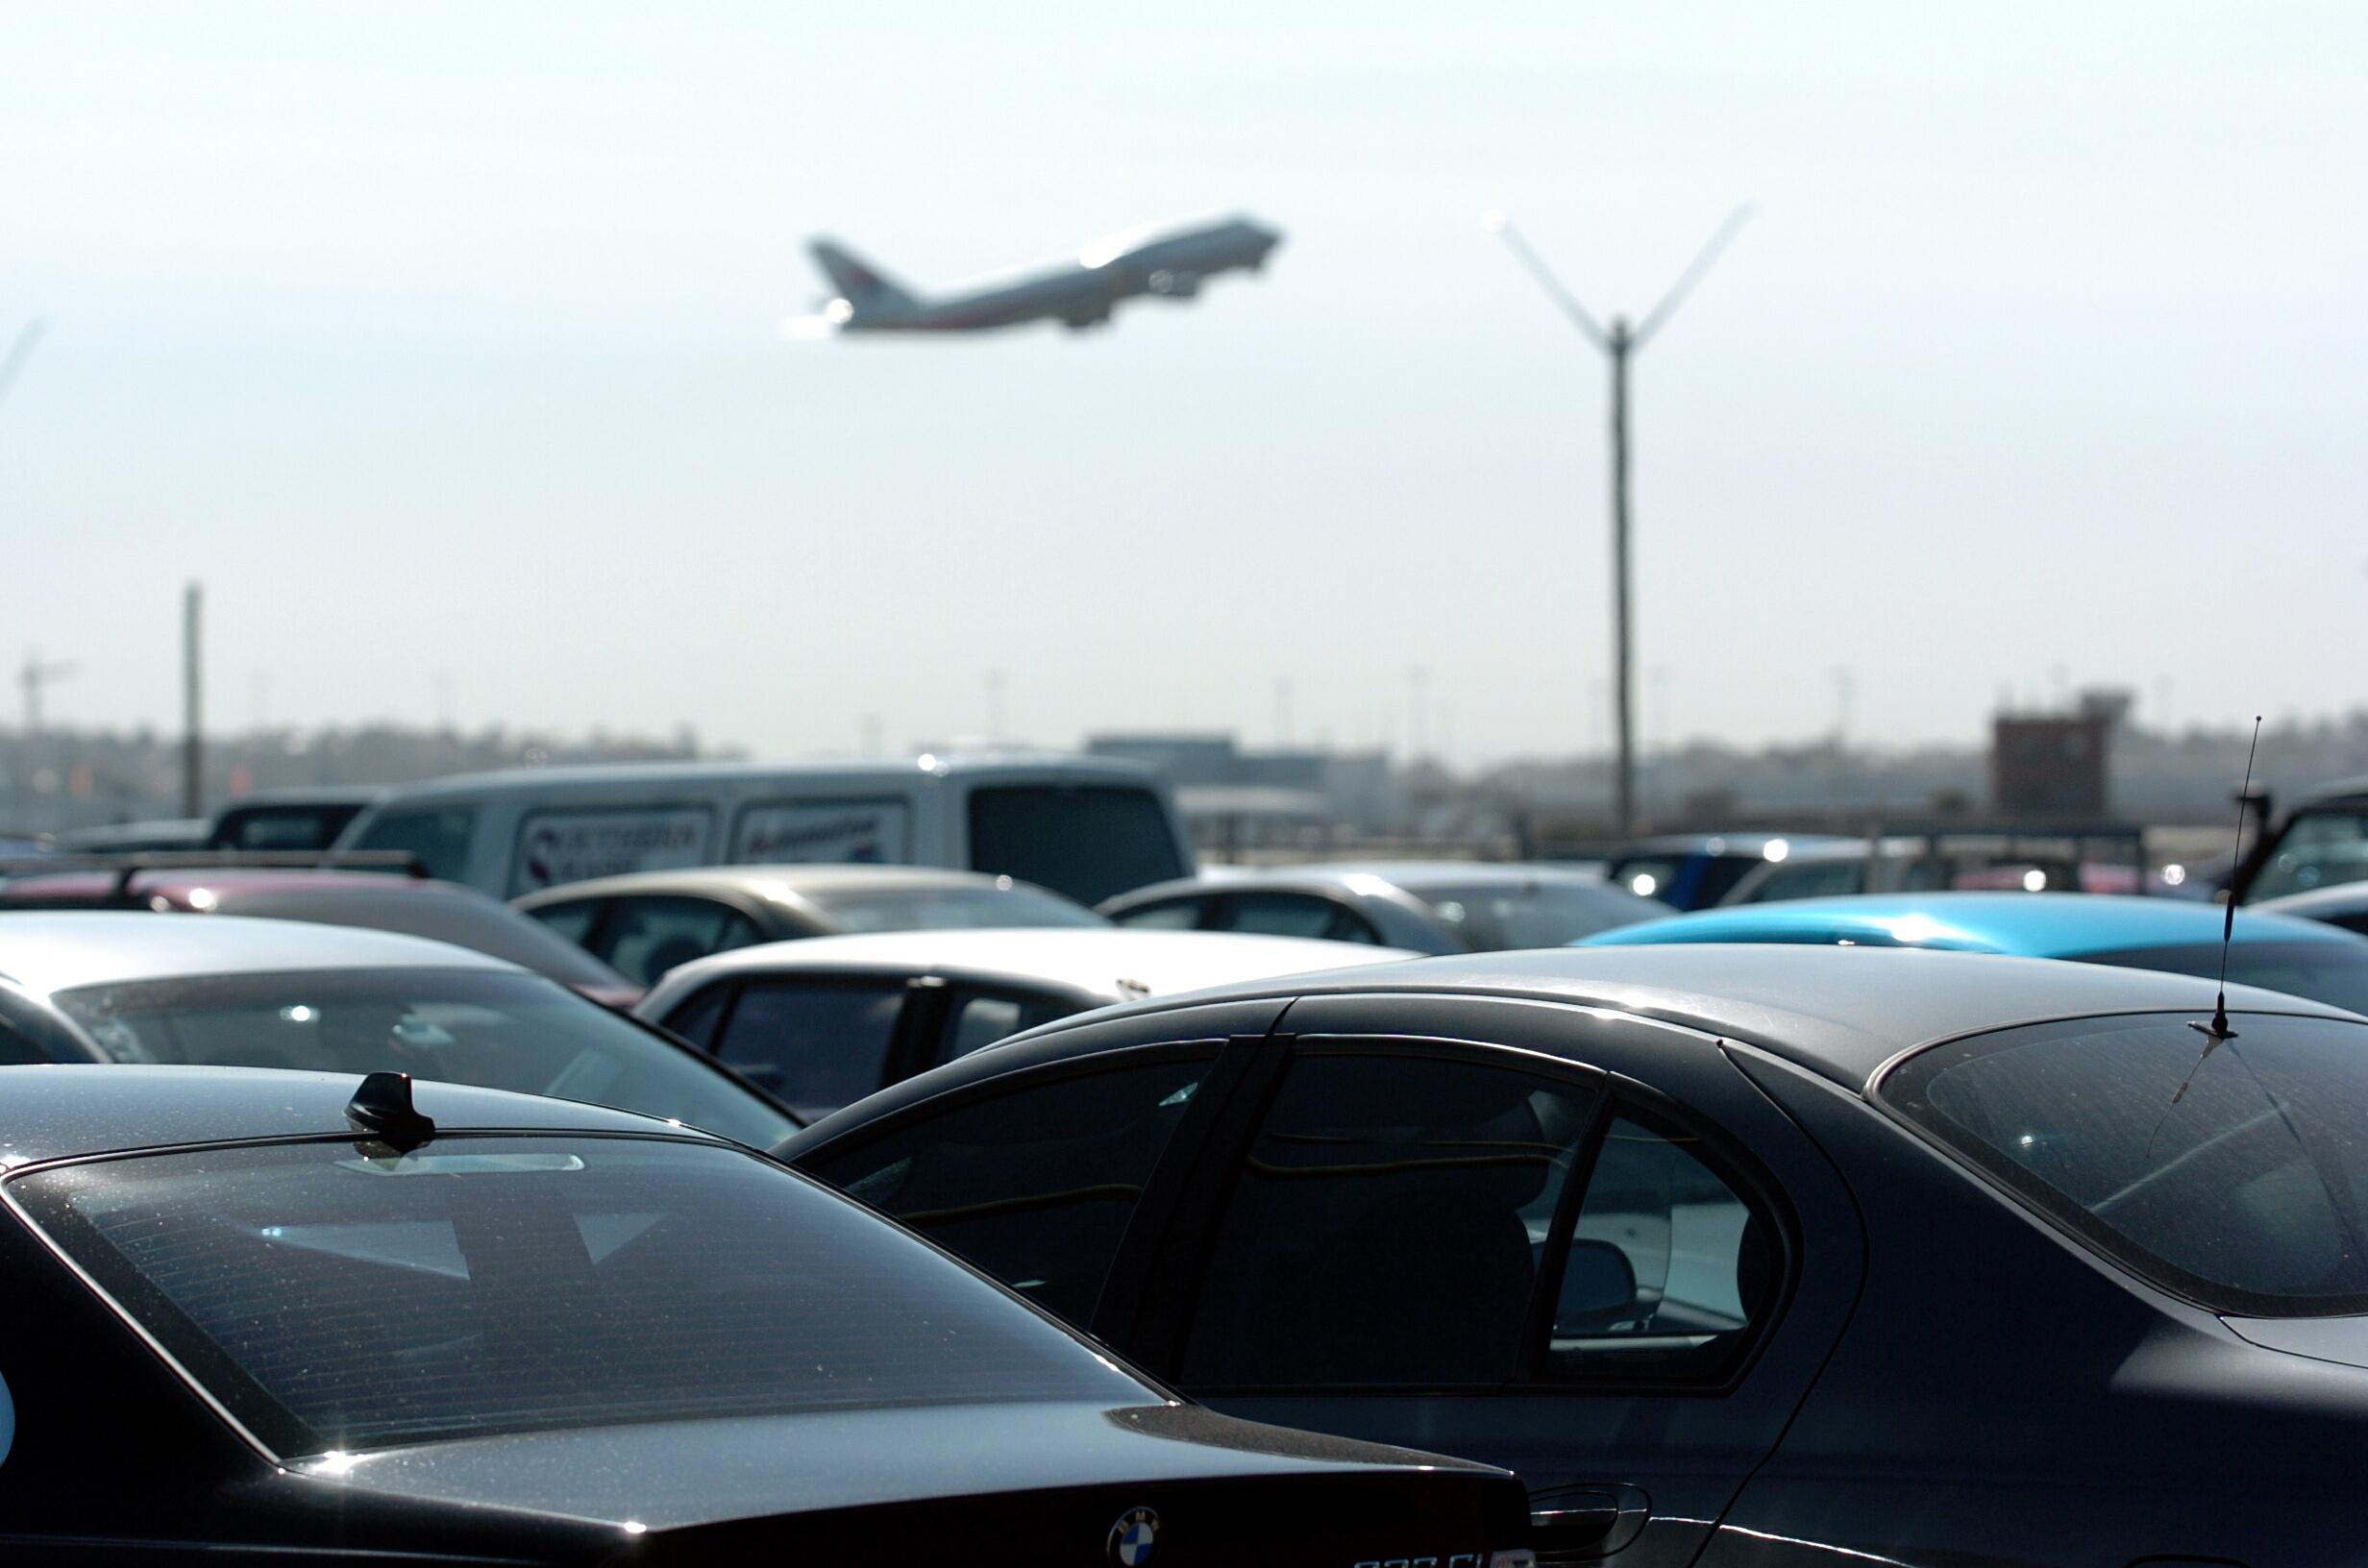 Portland Airport Long Term Parking >> Long Term Airport Parking Vs Short Term Airport Parking